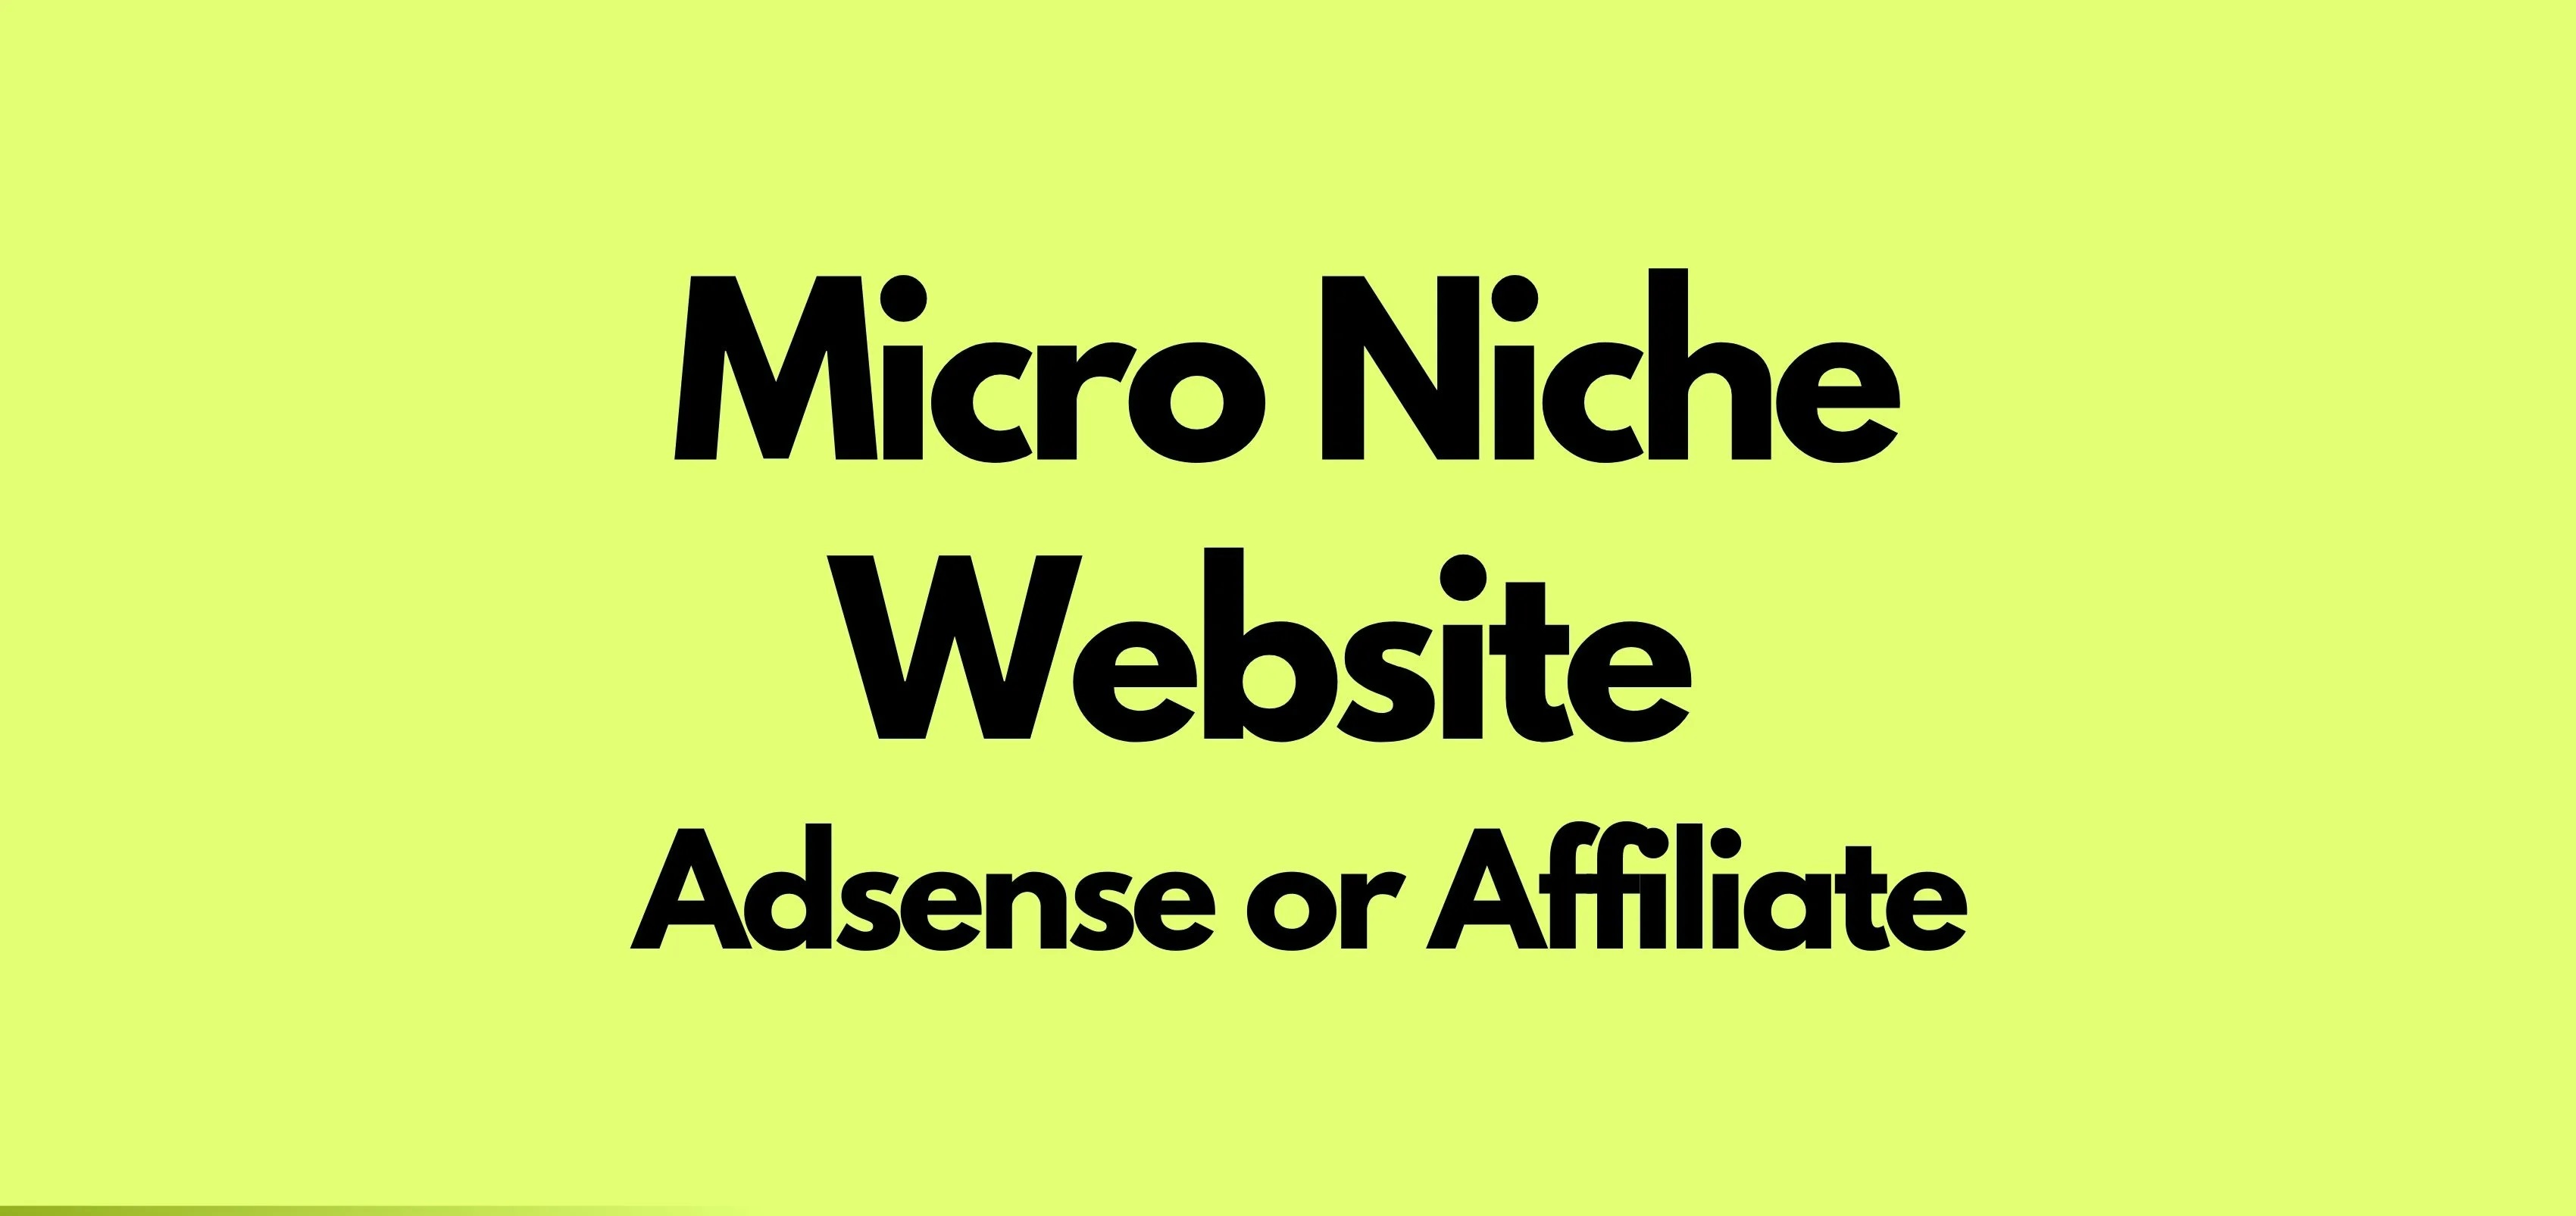 I Will Create An Adsense Micro-Niche Website